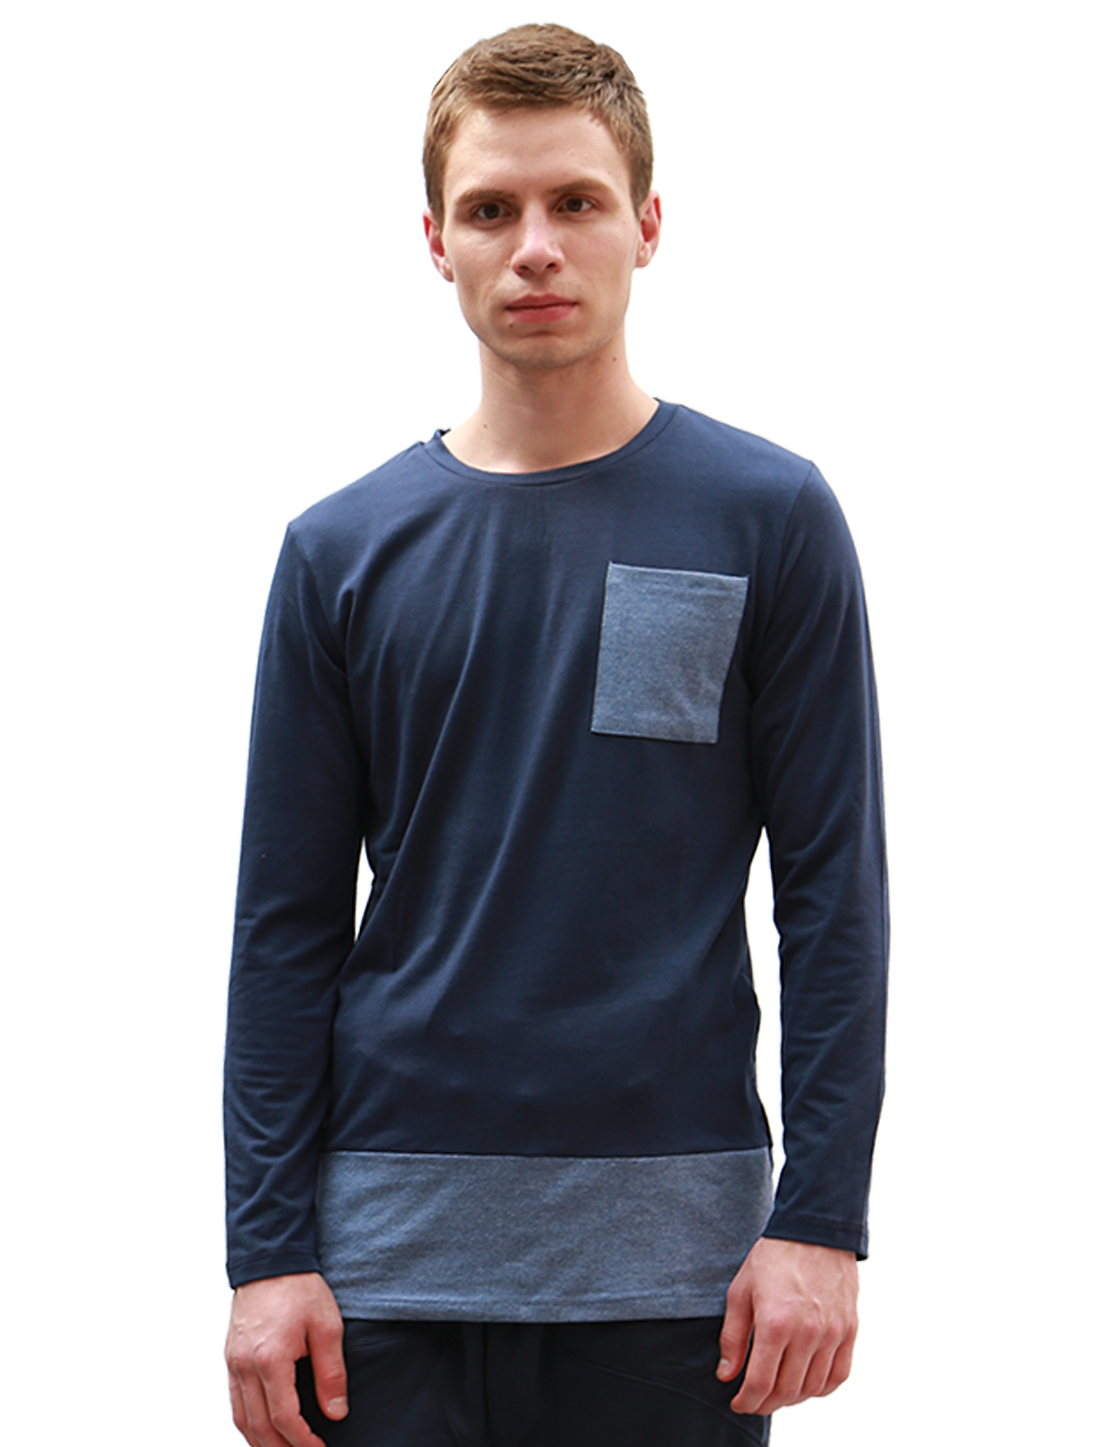 Men Contrast Color Longline Long Sleeve Chest Pocket Tee Shirt Navy Blue S